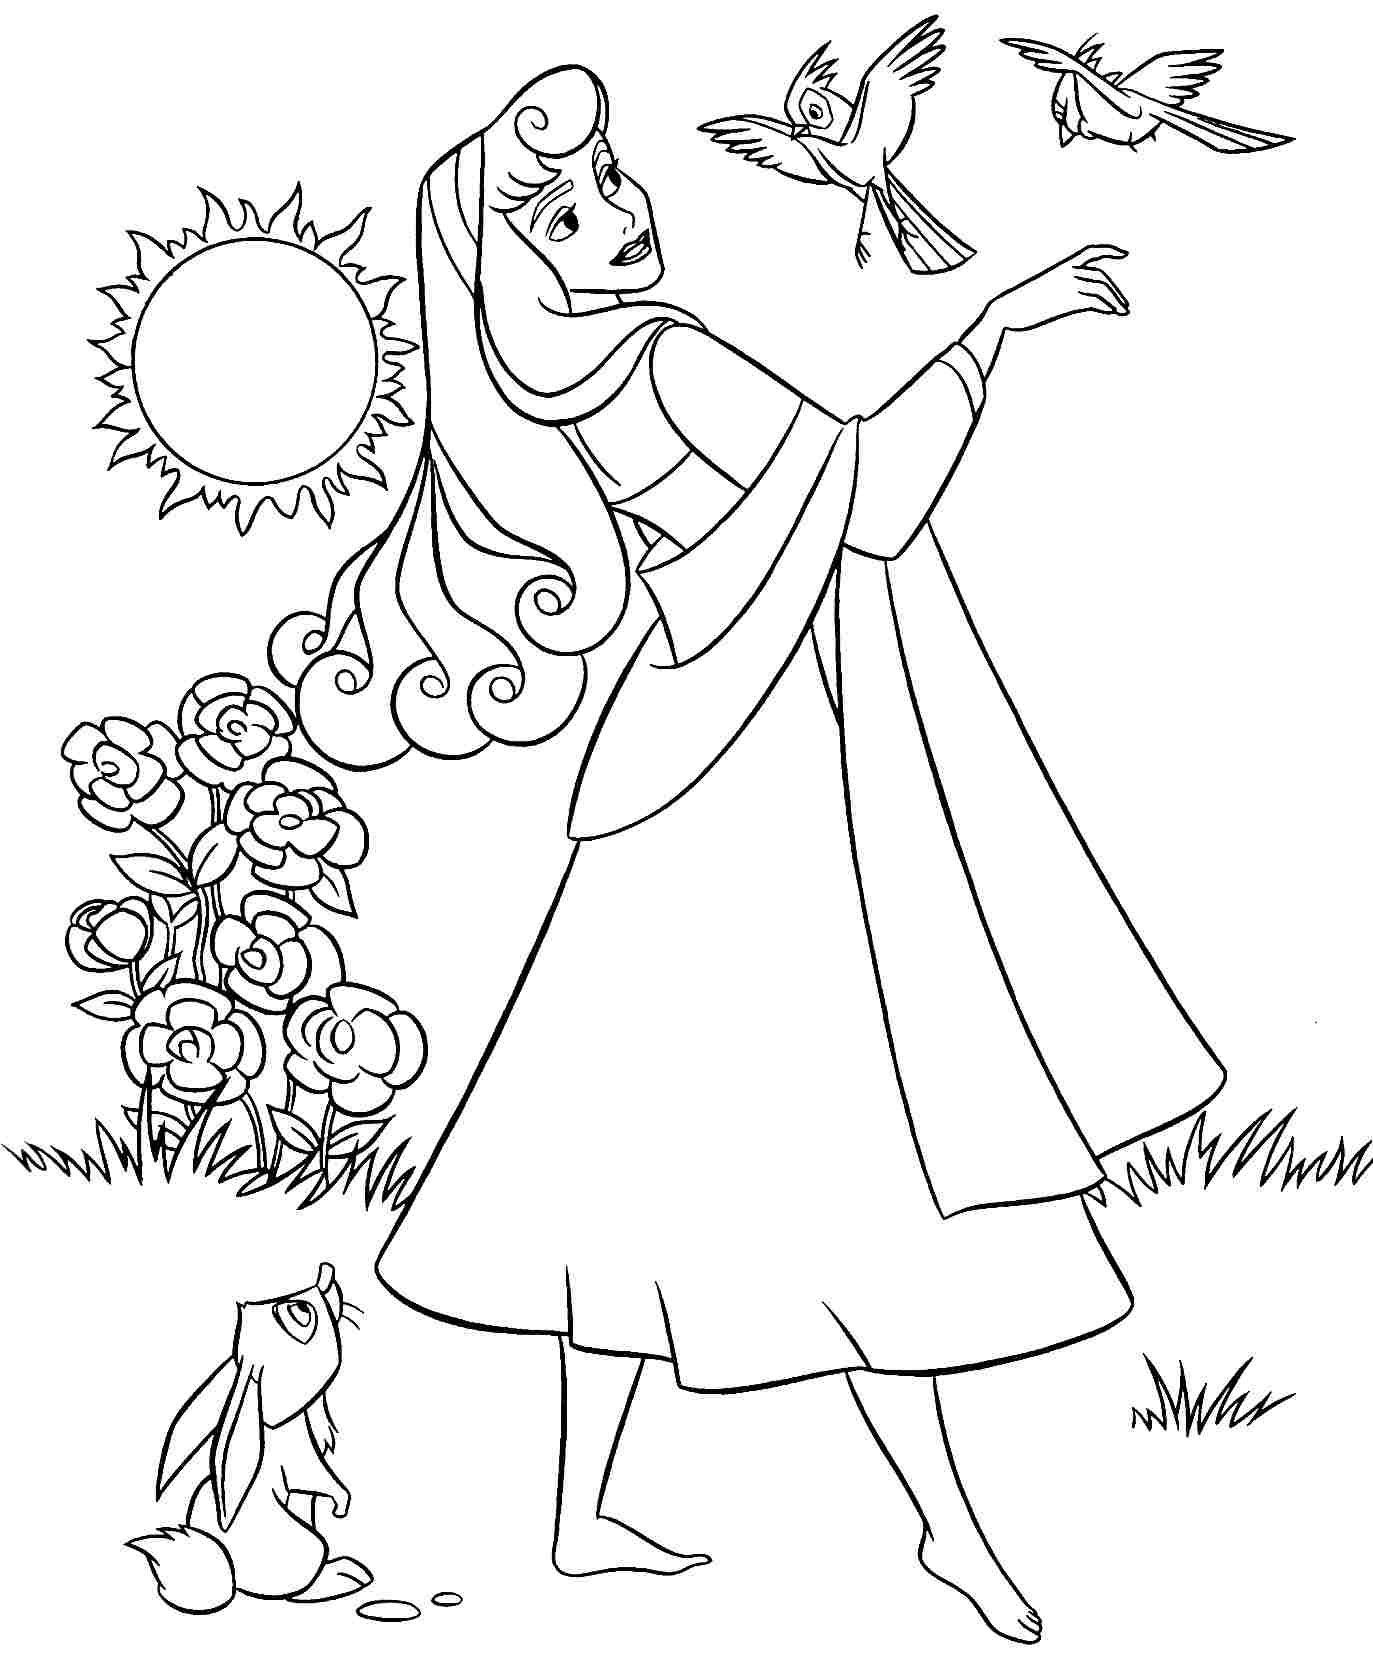 Sleeping Beauty Coloring Pages Disney2 Jpg 1373 1656 Disney Princess Coloring Pages Sleeping Beauty Coloring Pages Princess Coloring Pages